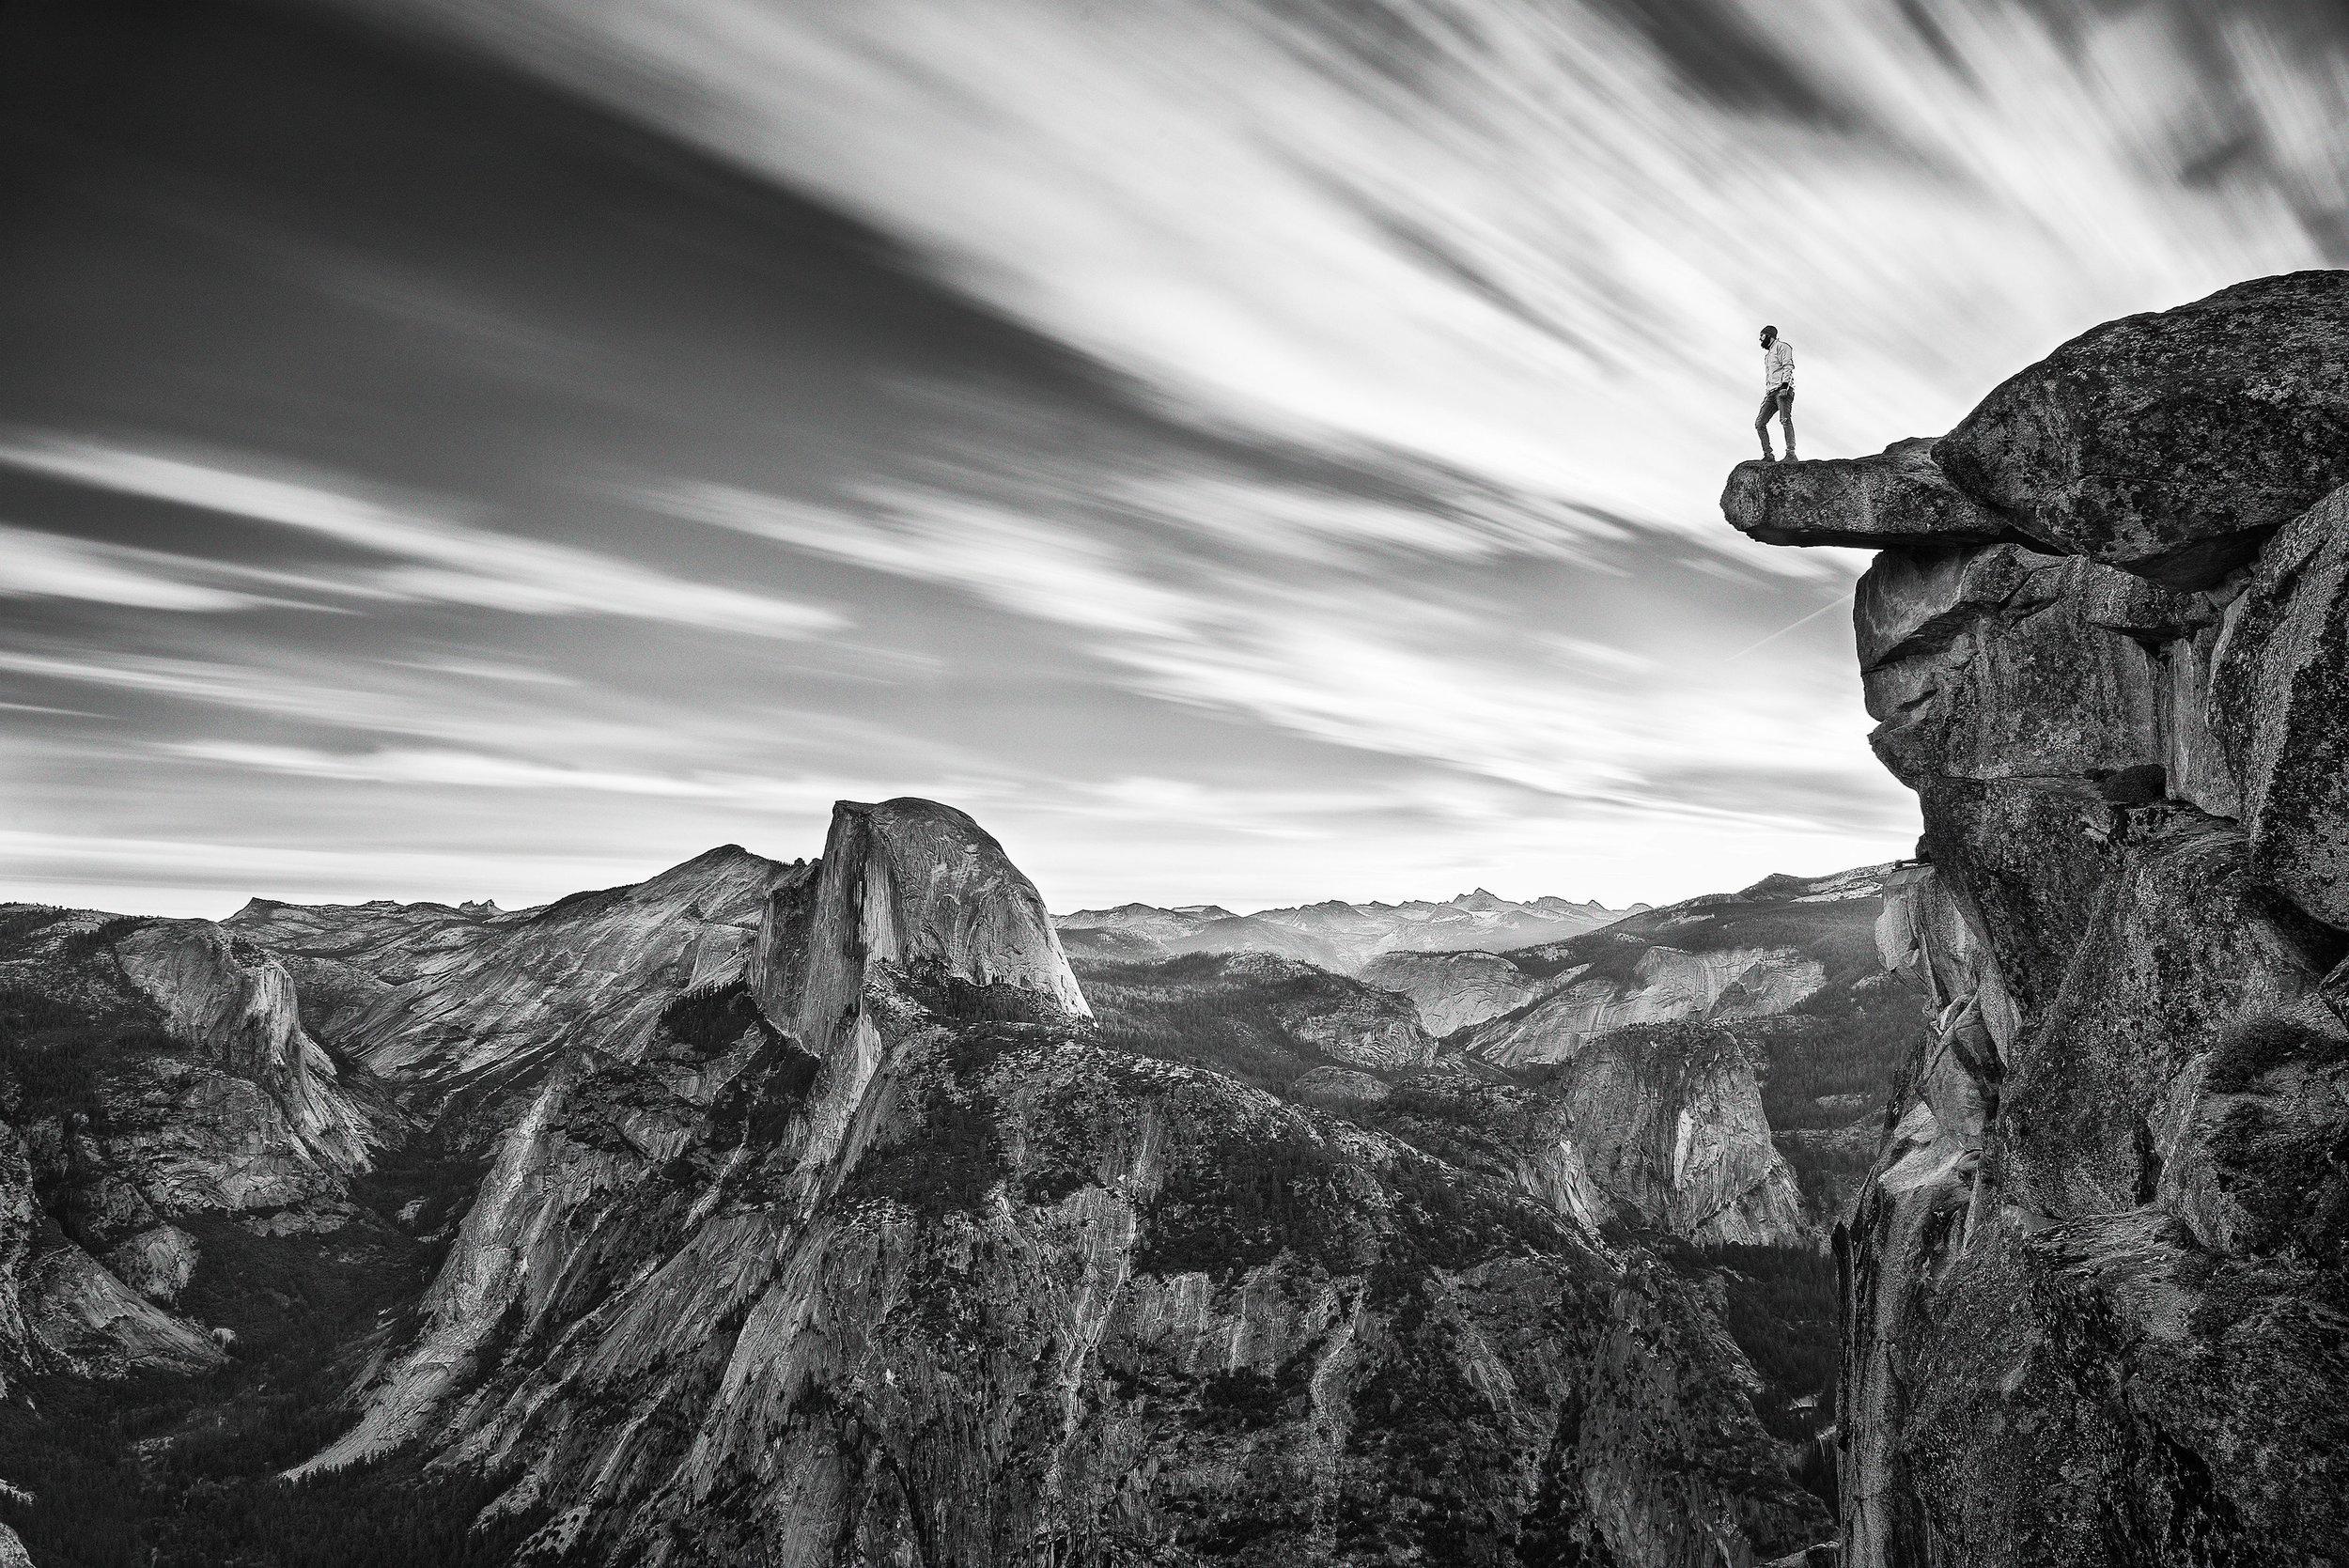 austin-trigg-yosemite-national-park-Glacier-Point-half-dome-valley-long-exposure-balck-white-cliff.jpg